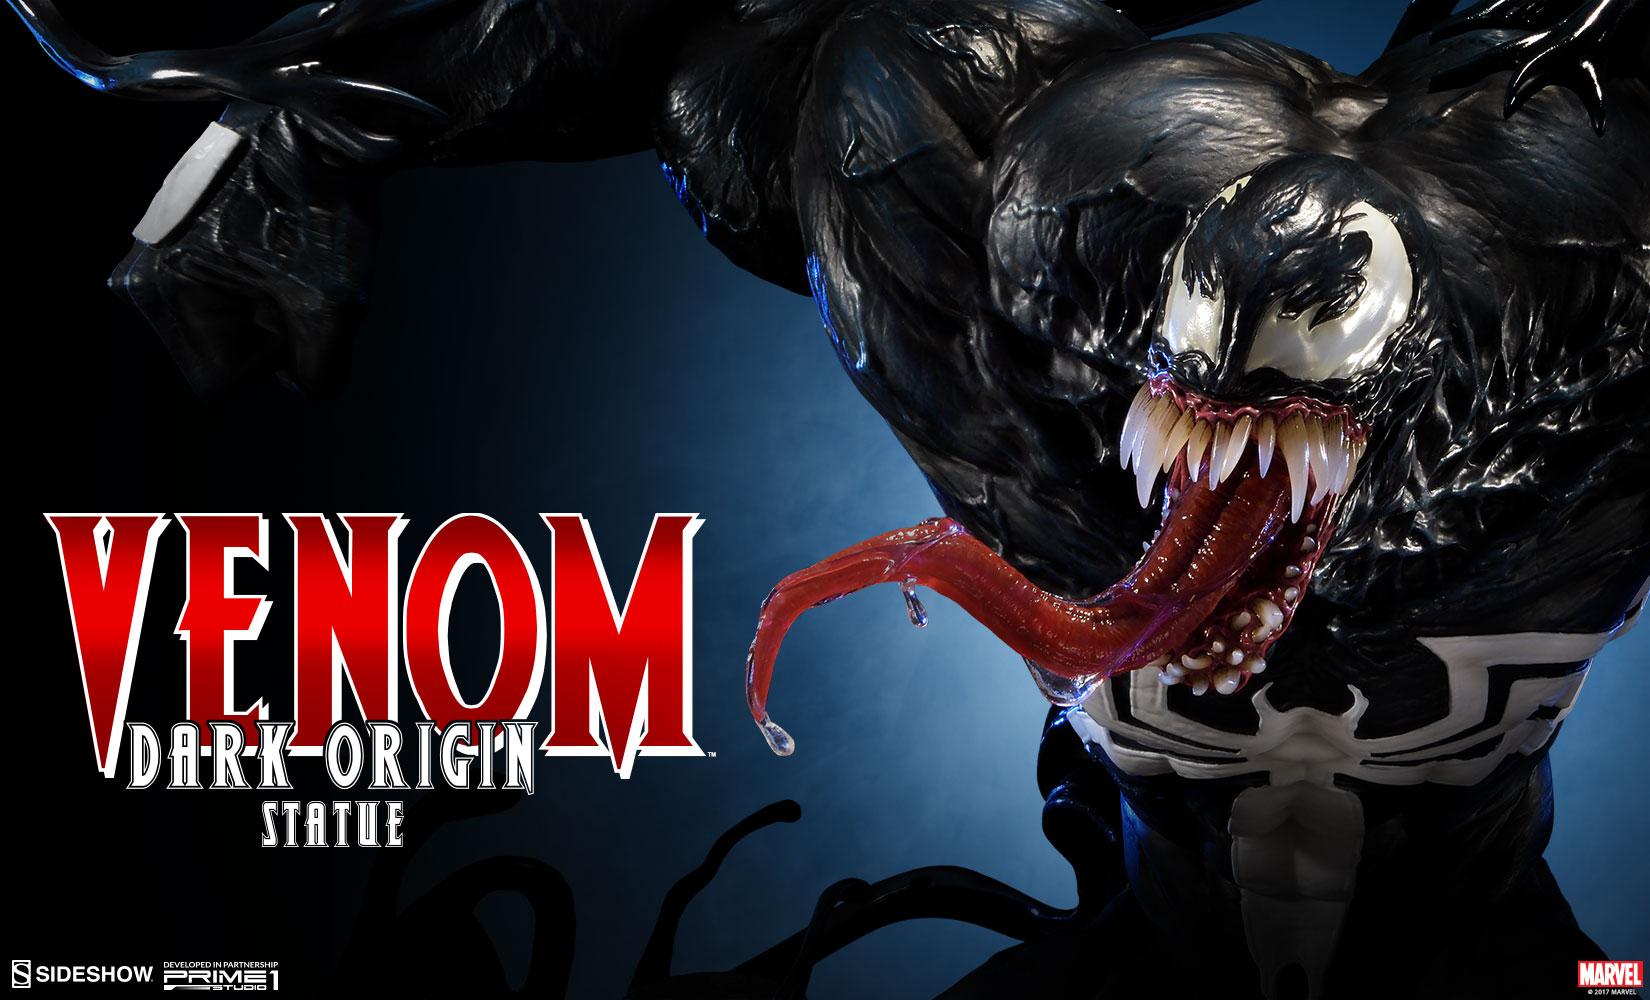 marvel-venom-dark-origins-statue-prime1-studio